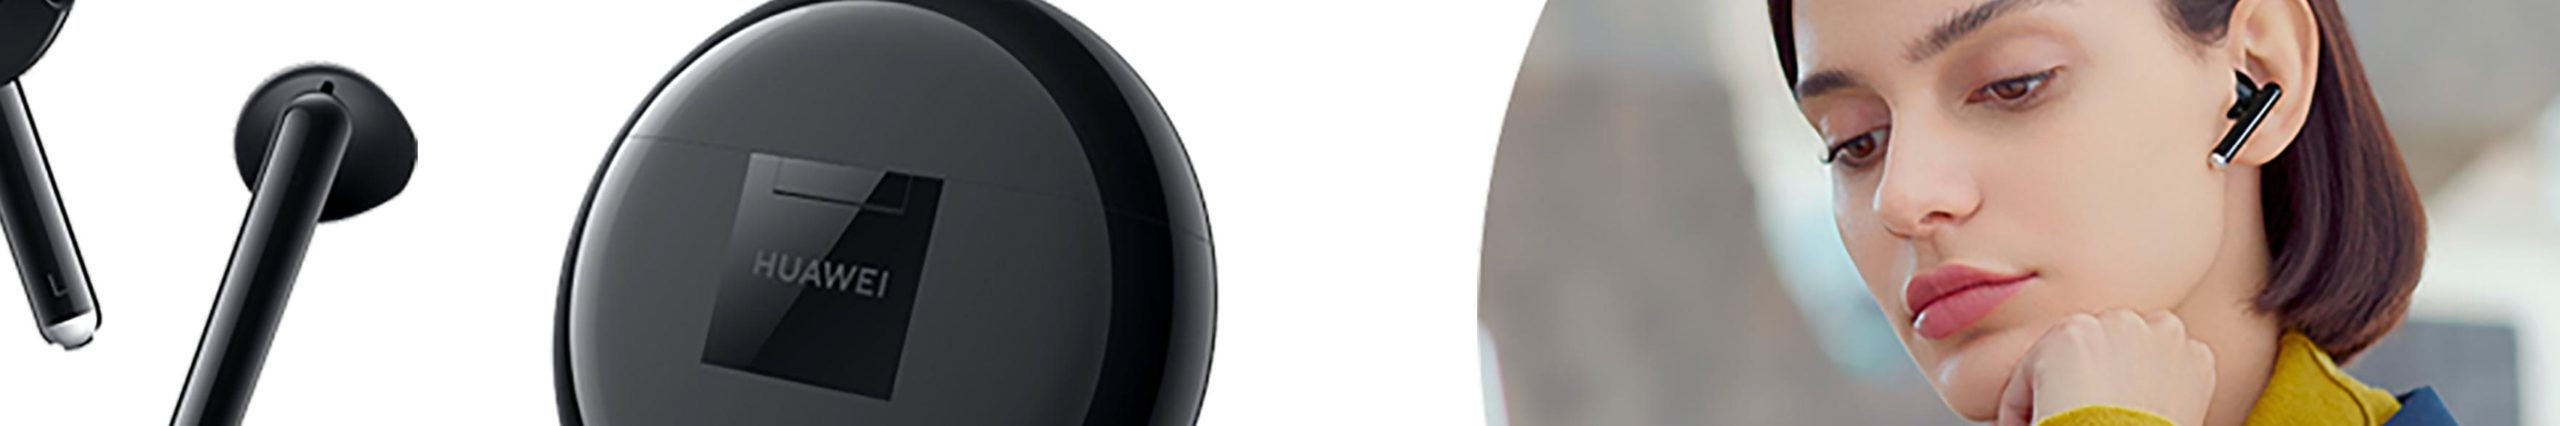 Auricolari Bluetooth Elettronica Cicala